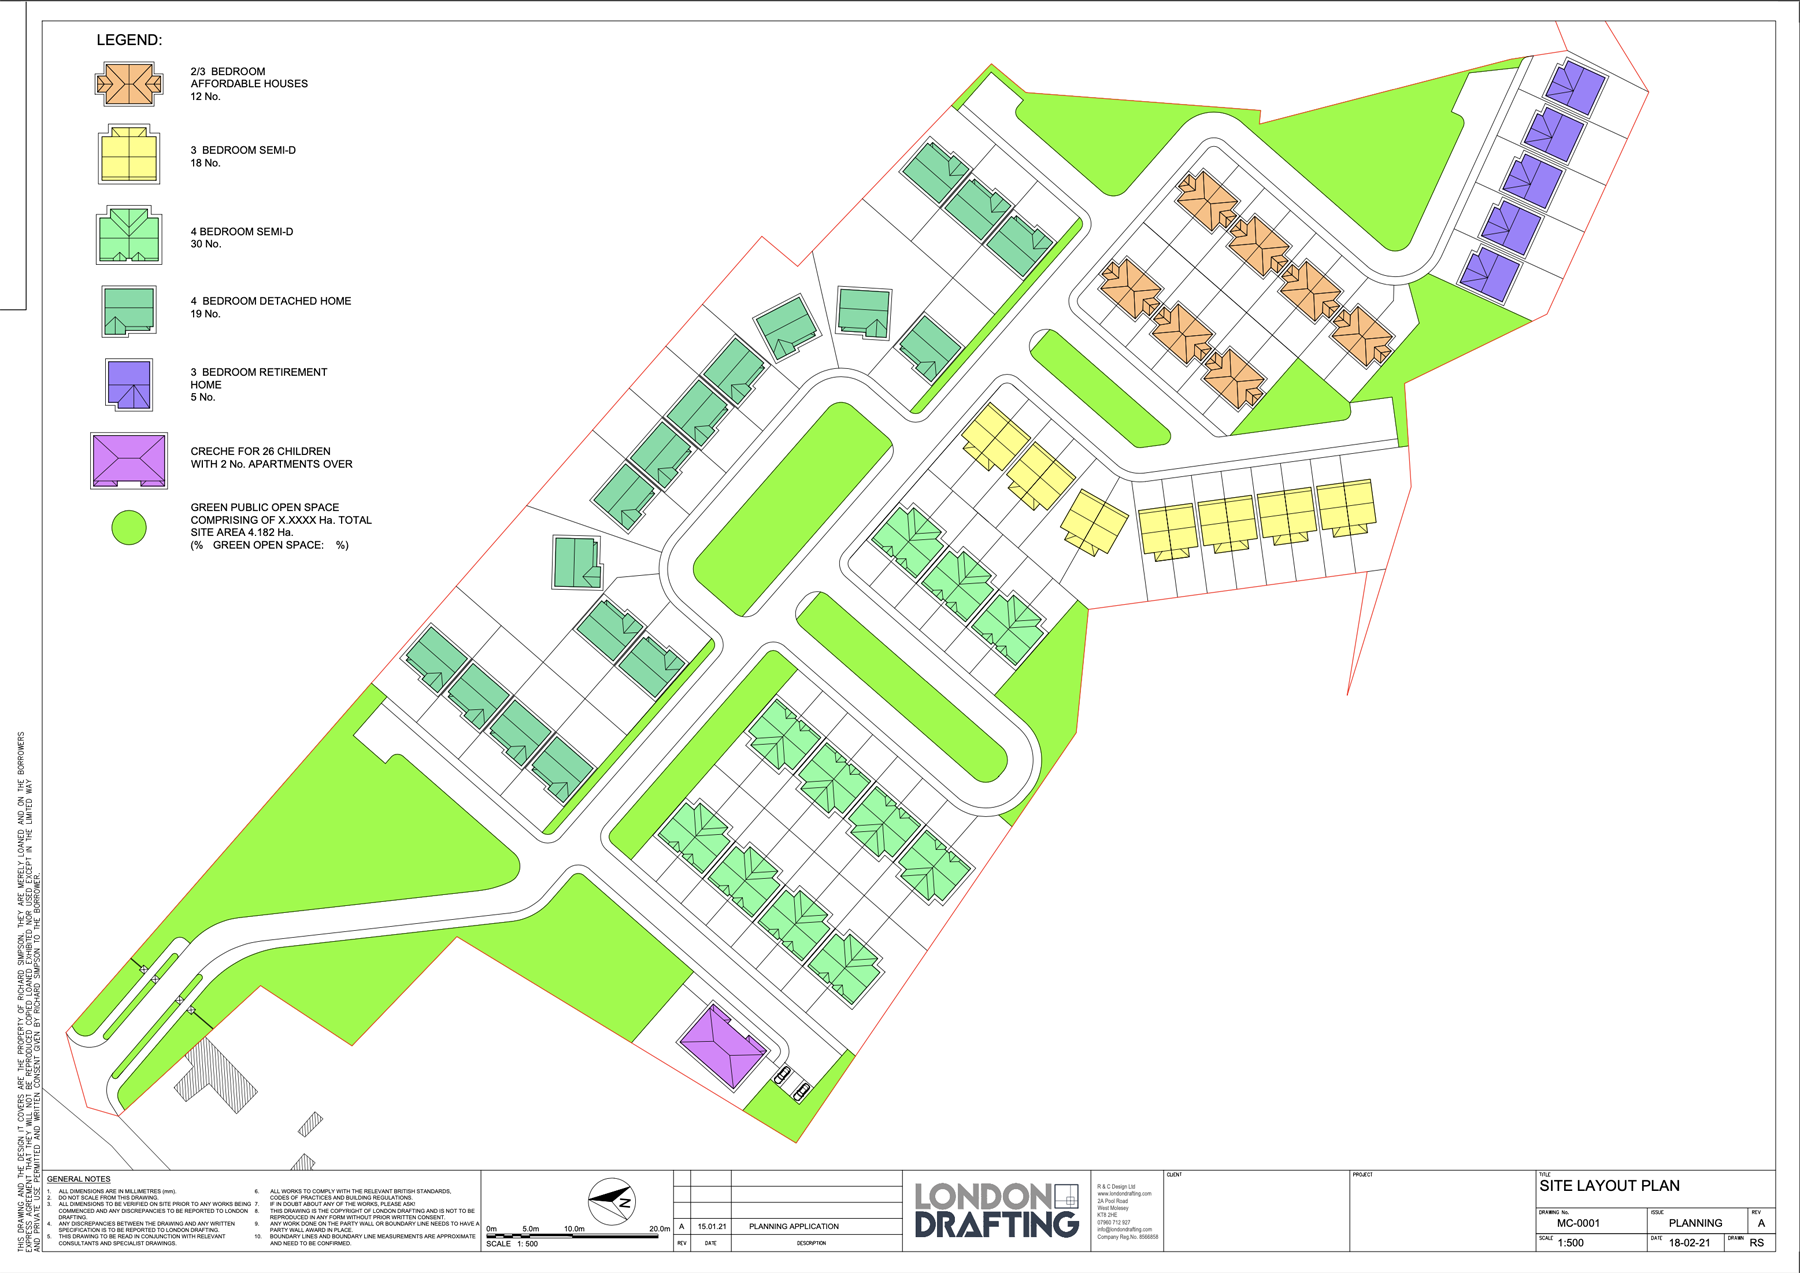 Building site layout plan